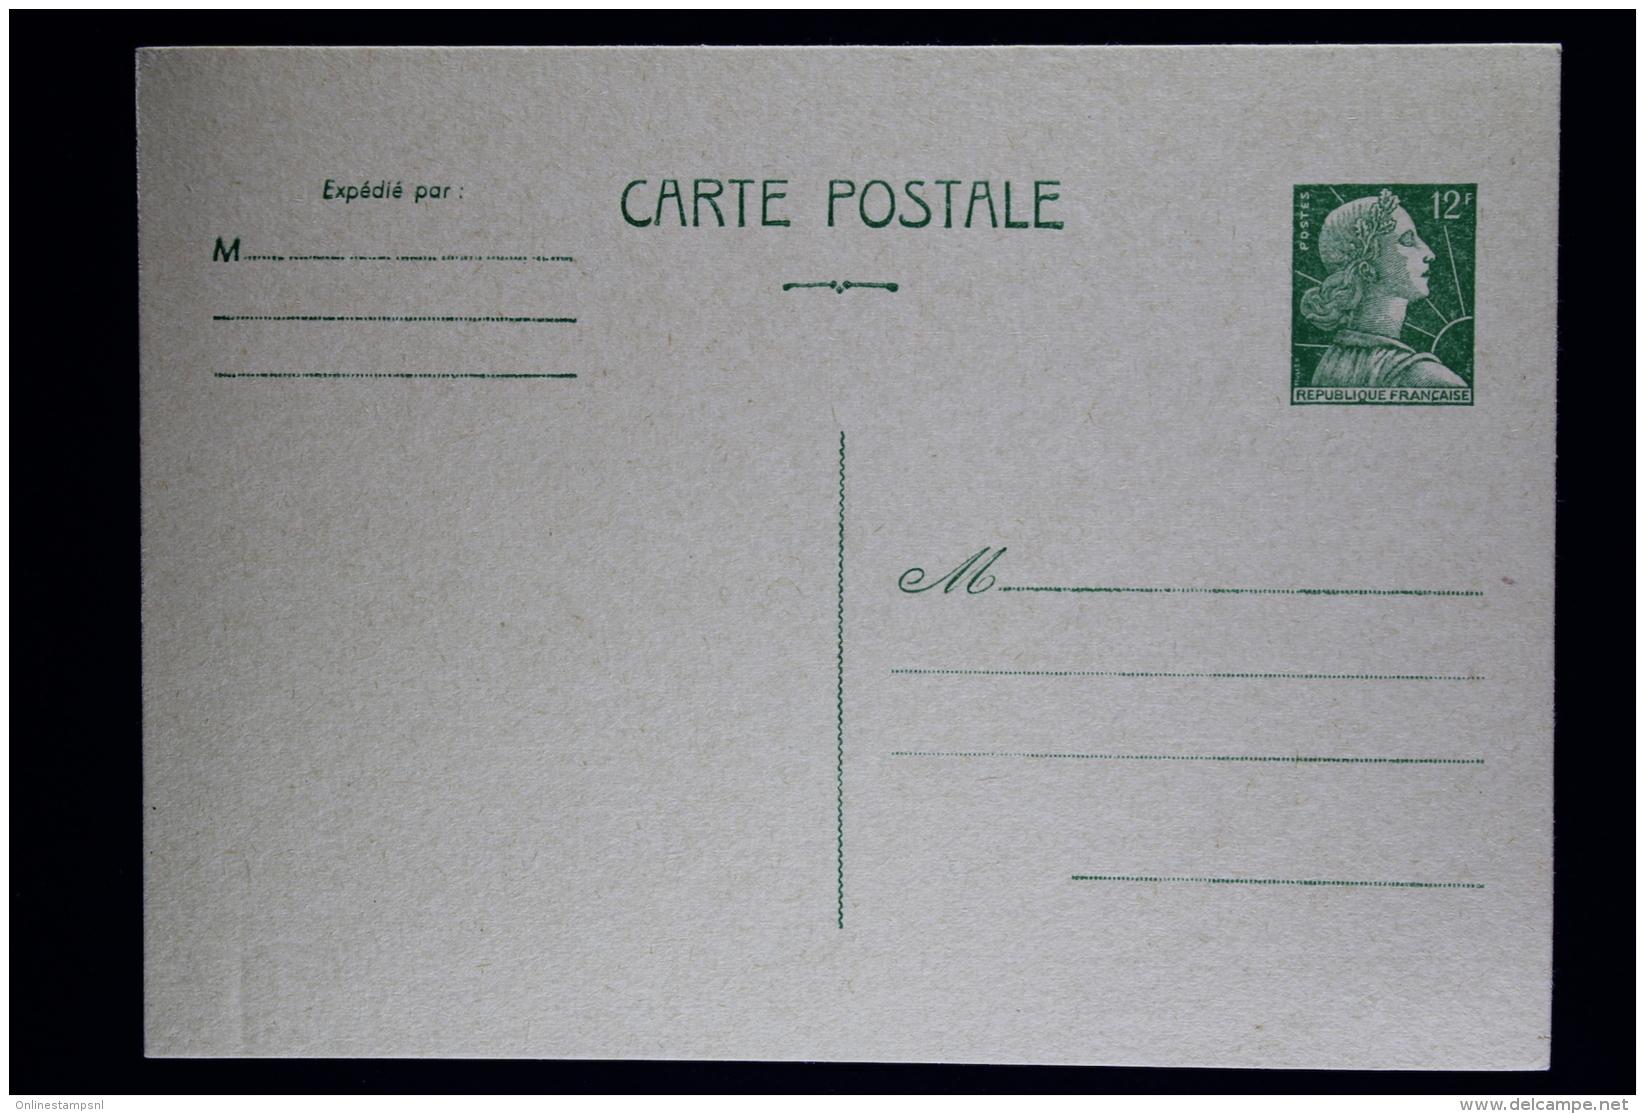 France  Carte Postale Muller  Type  A2  1955 - Biglietto Postale